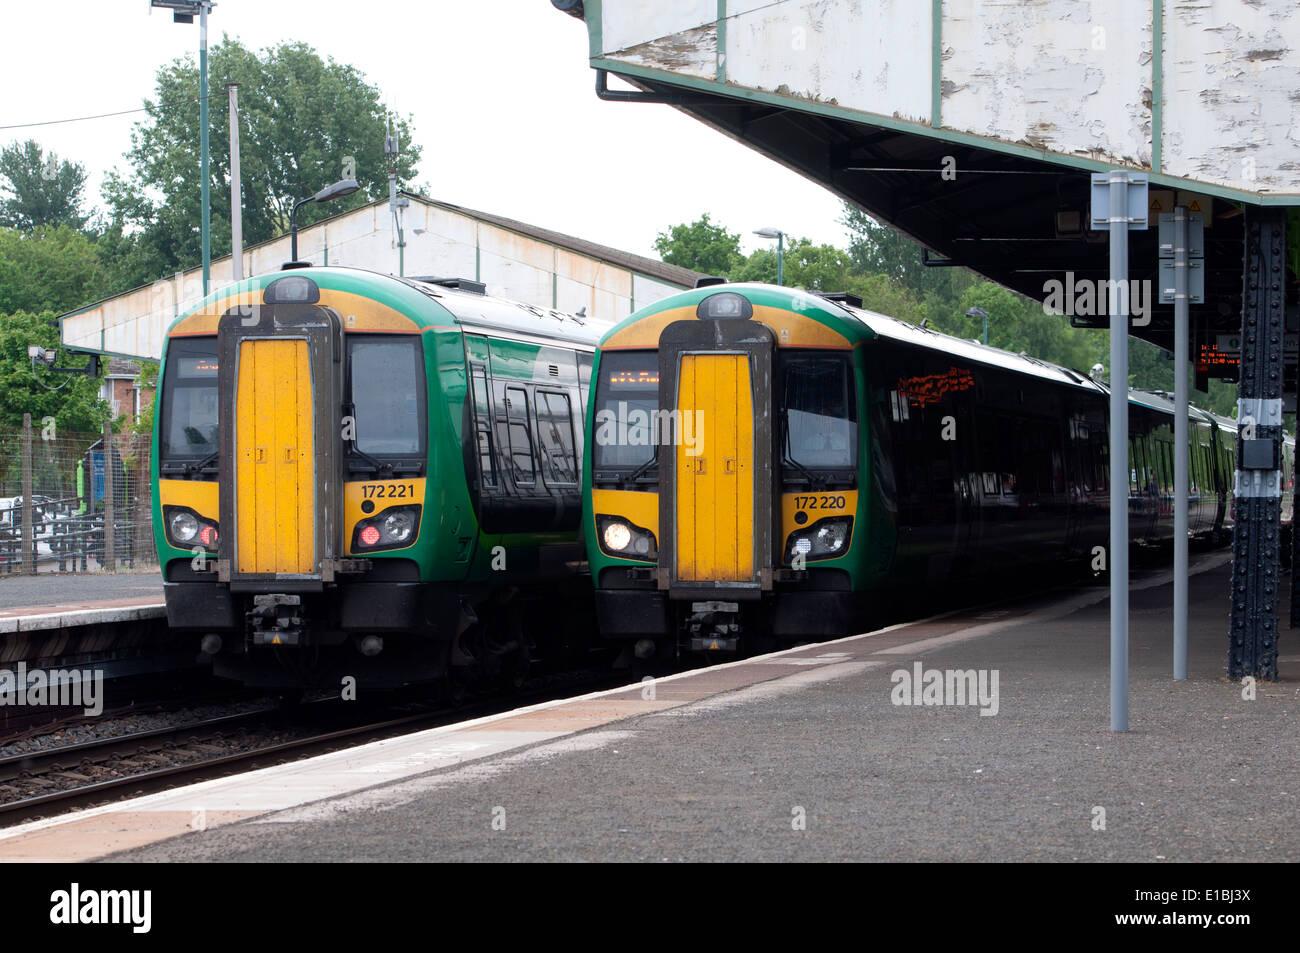 London Midland class 172 diesel trains at Stourbridge Junction station, Worcestershire, UK - Stock Image